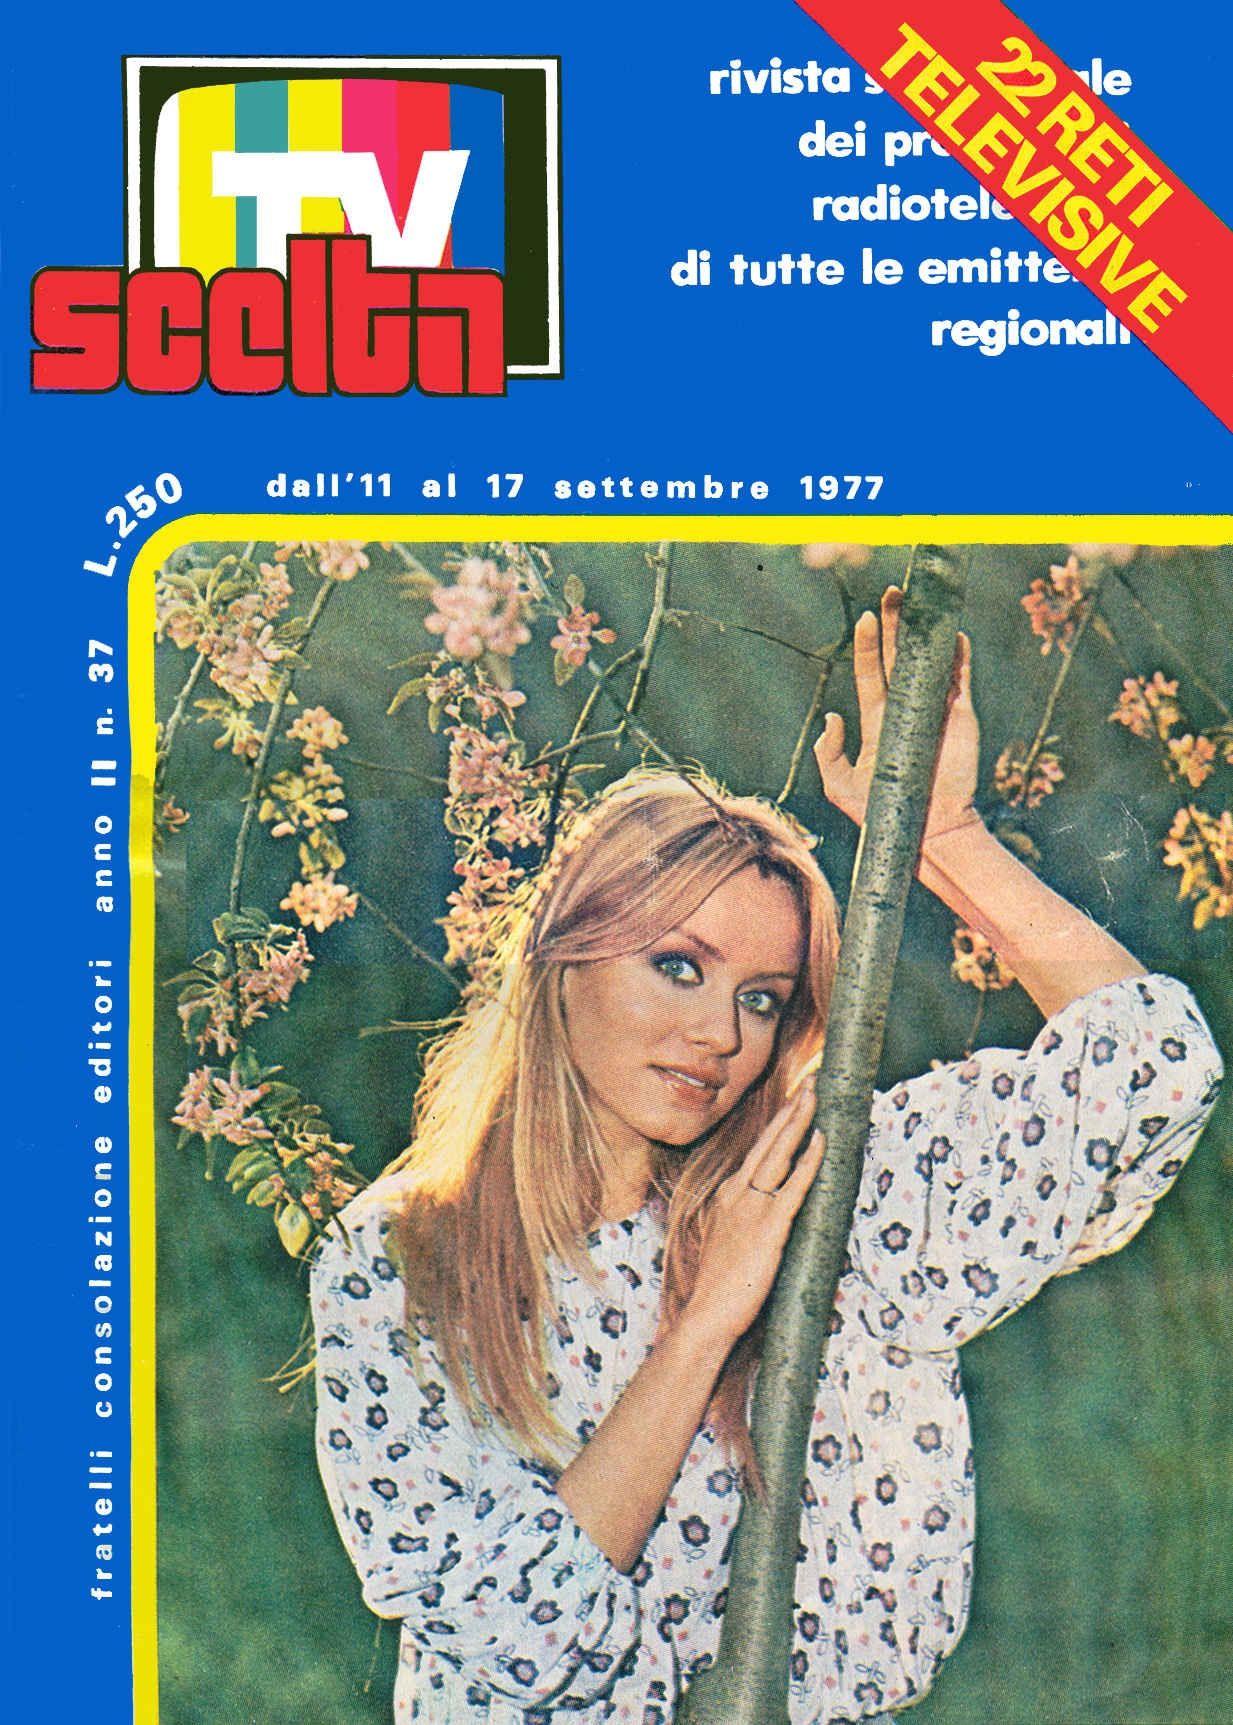 Gloria Guida (born 1955)